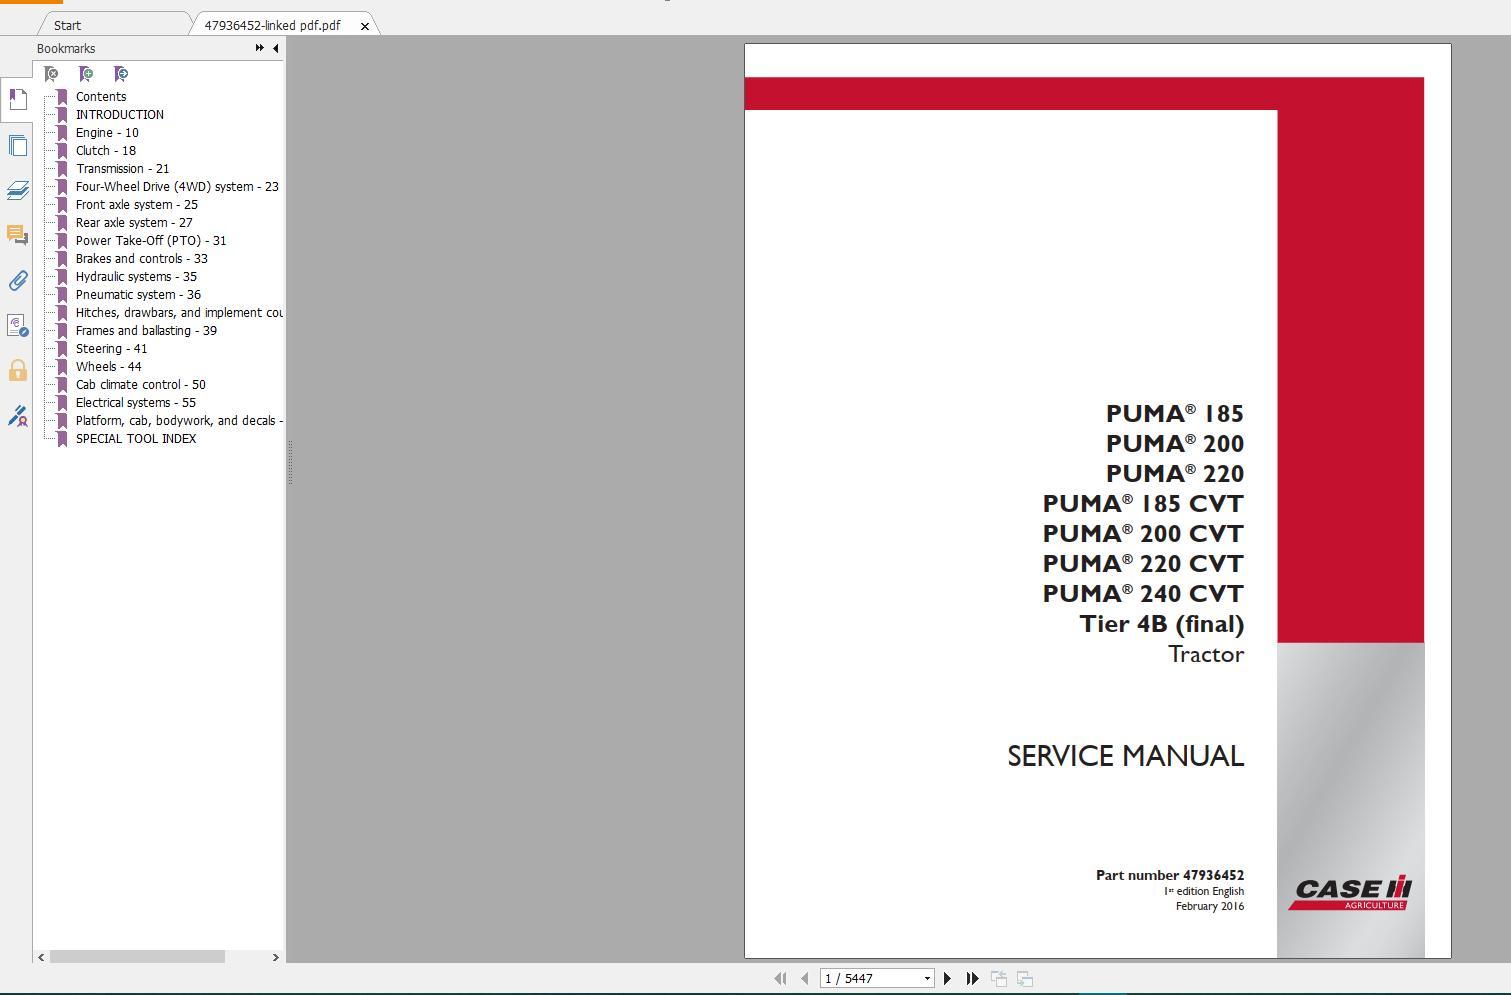 Case_Machine_New_Model_Service_Manual_Full_DVD_20191 (1)